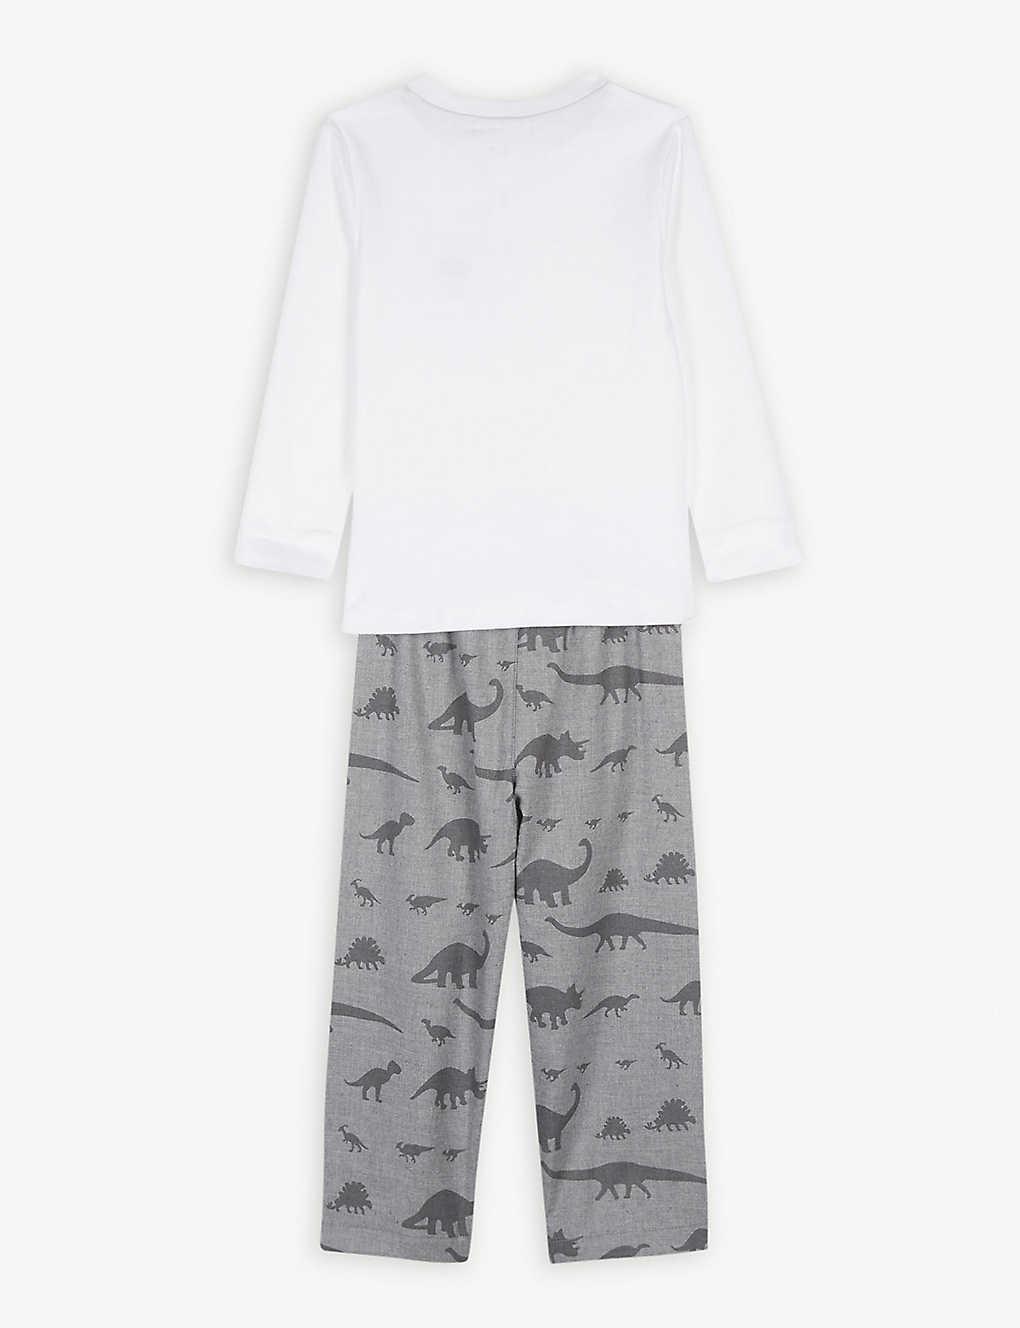 0ede29d3 THE LITTLE WHITE COMPANY - Dinosaur flannel pyjama (1-6 years ...